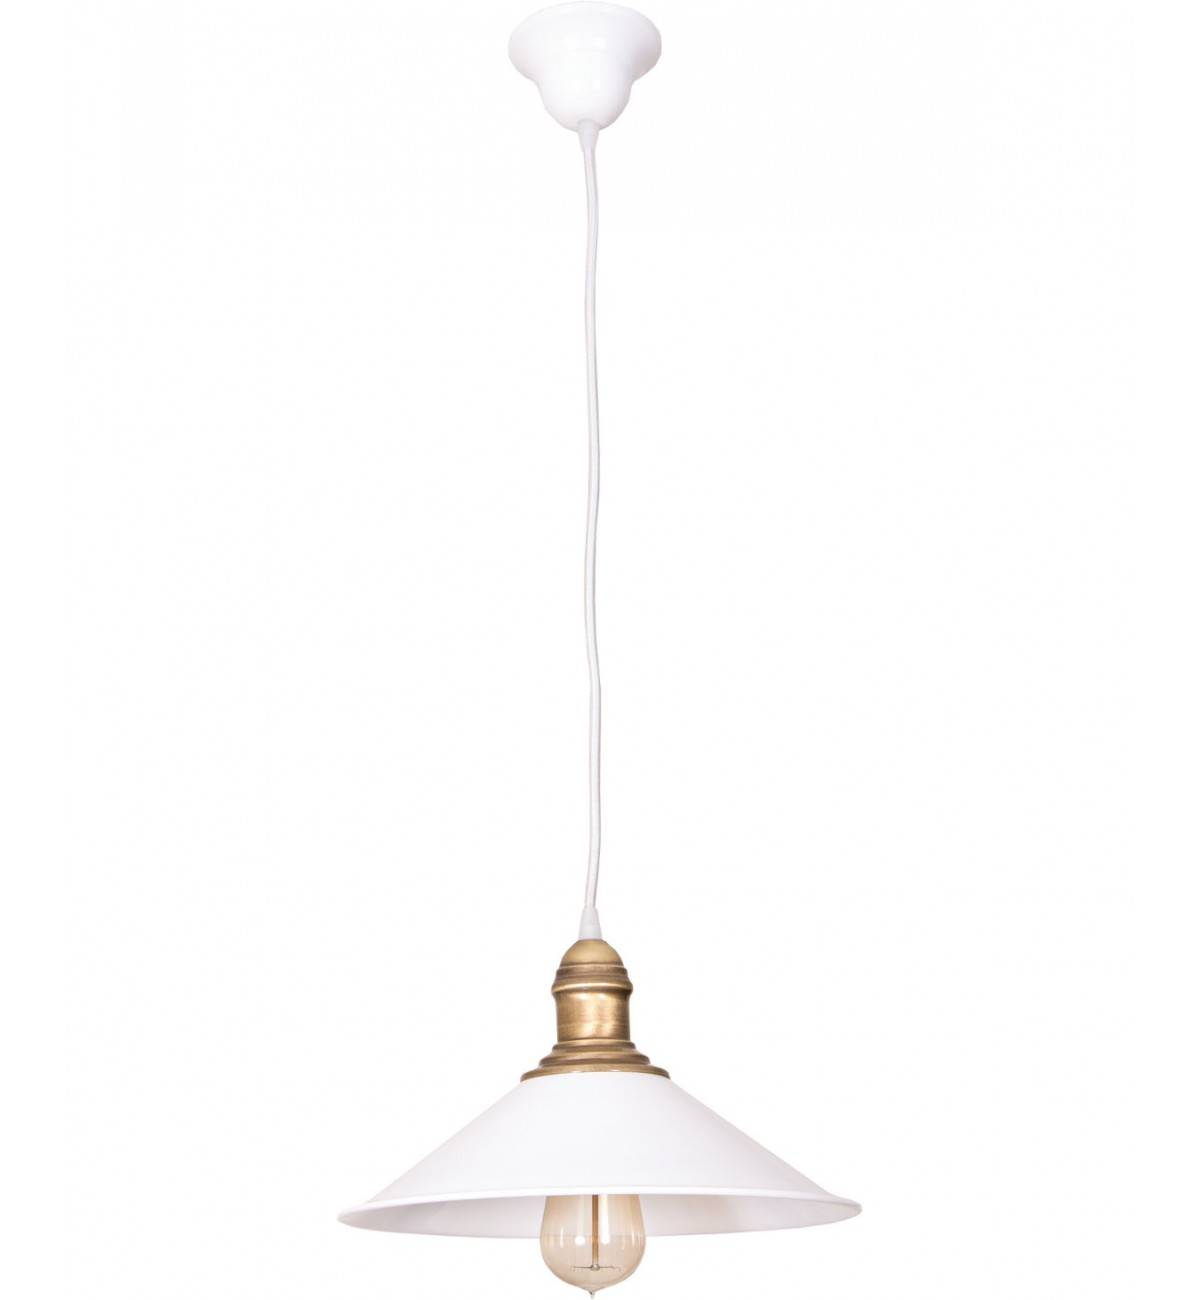 lampy kuchenne wiszące retro